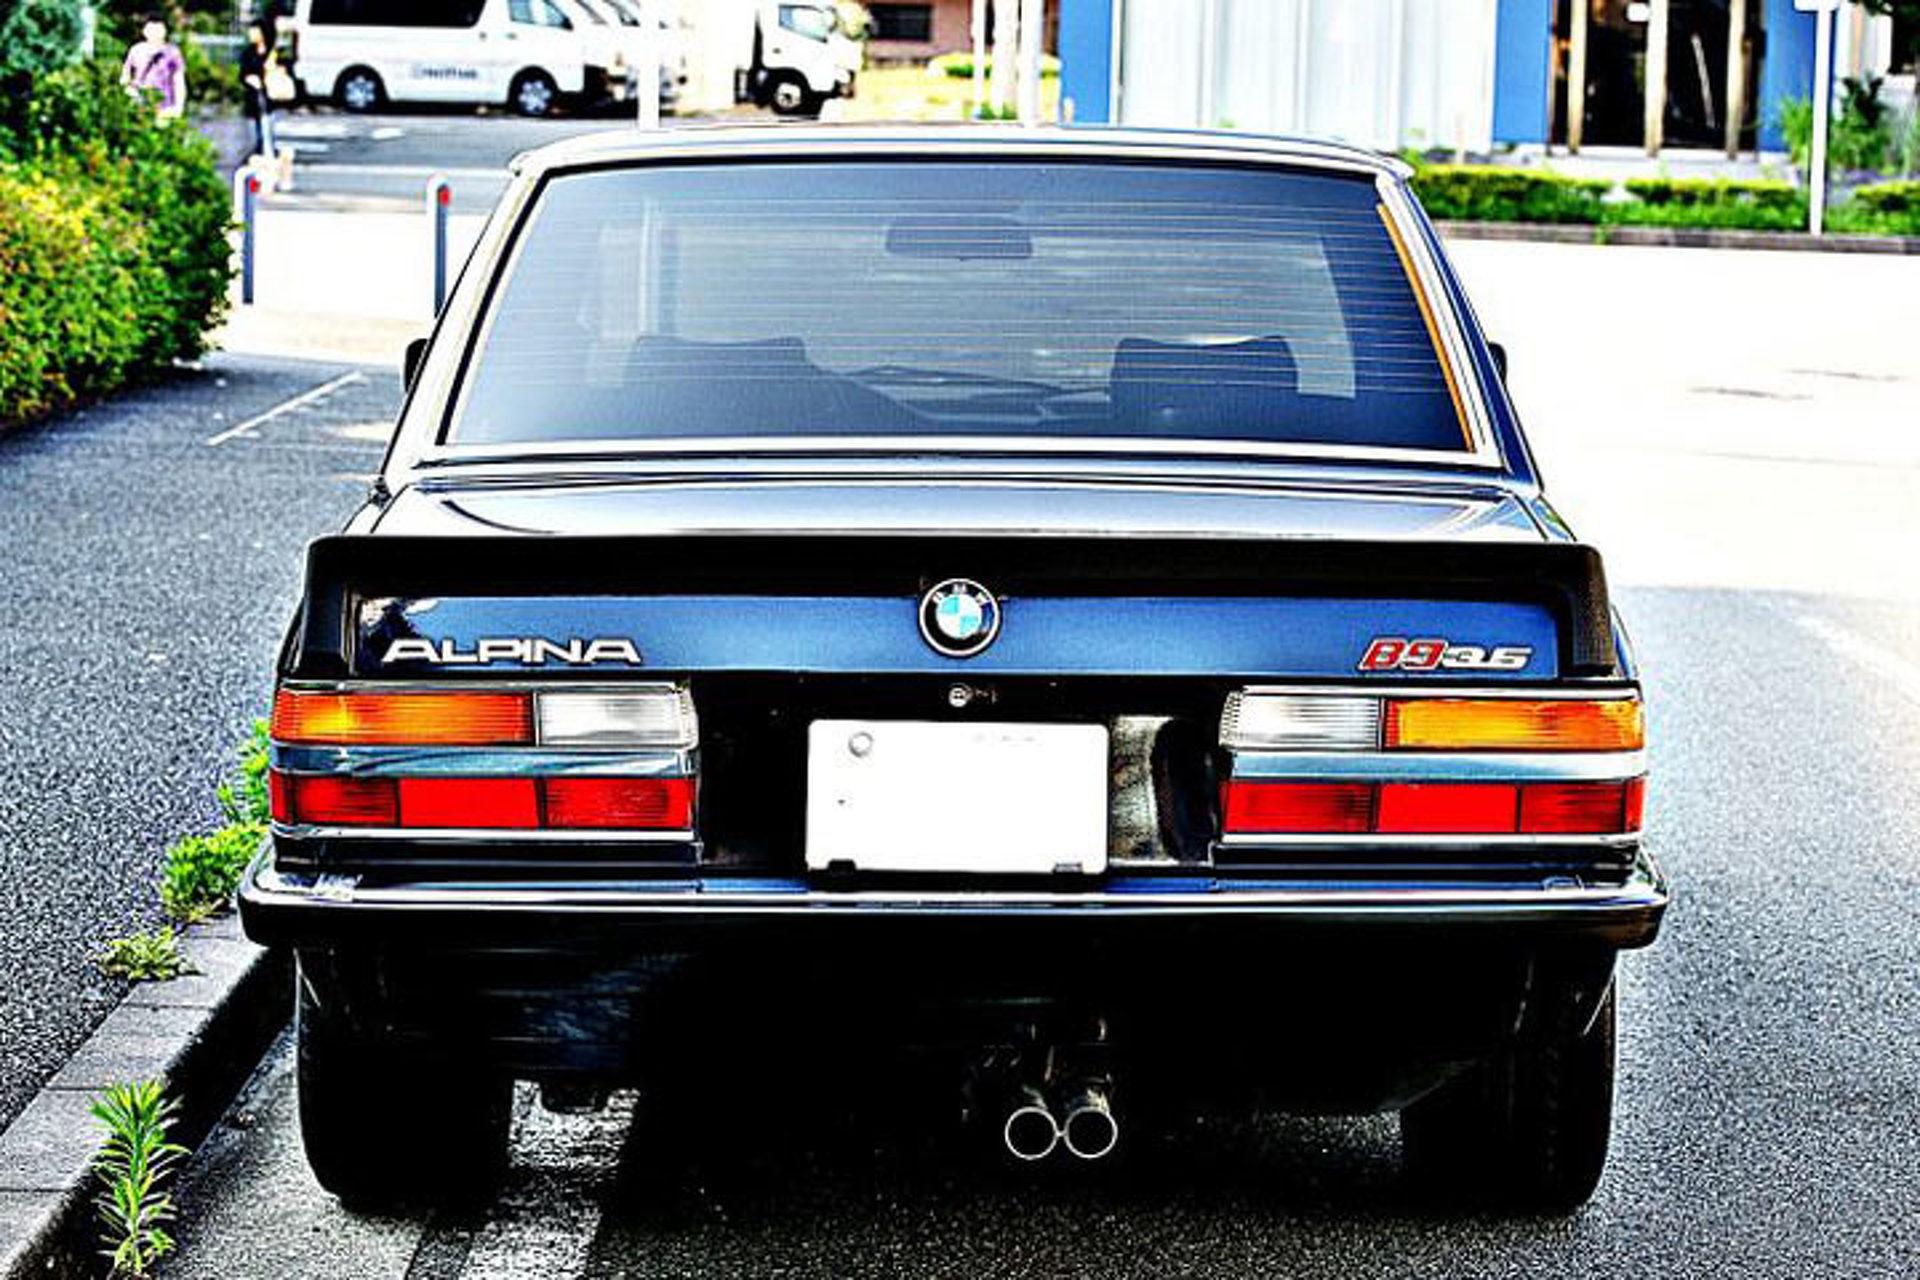 Alpina B9 1981 - 1985 Sedan #7